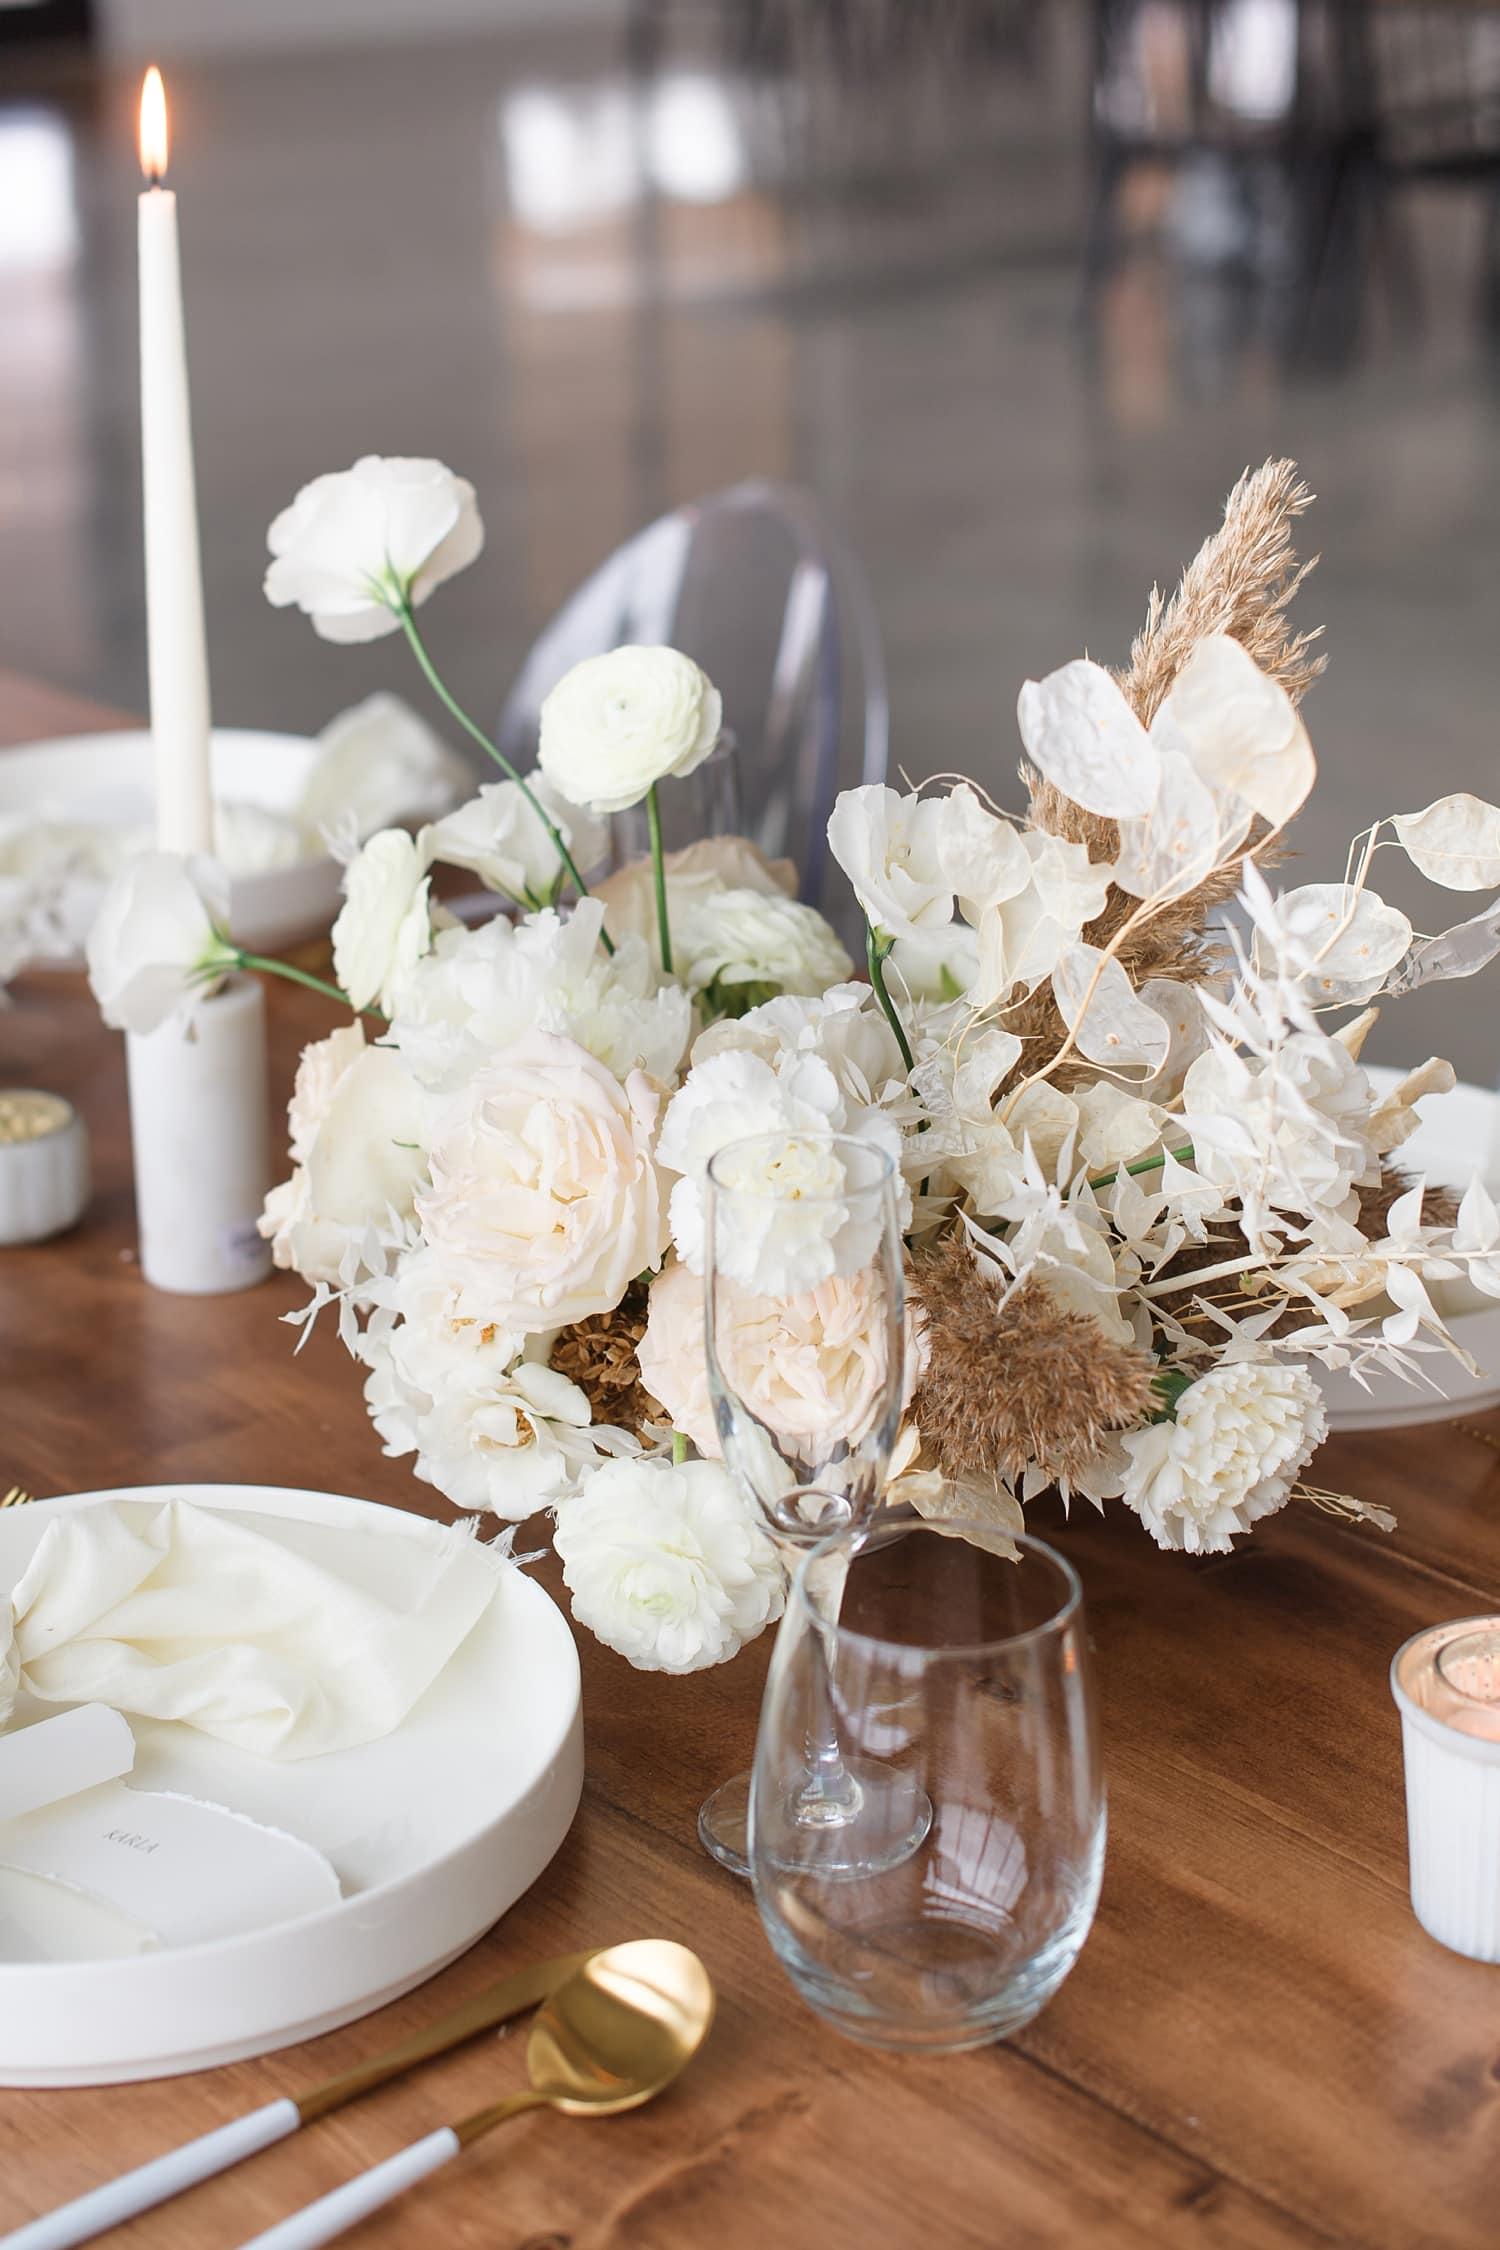 mod boho white wedding centerpiece